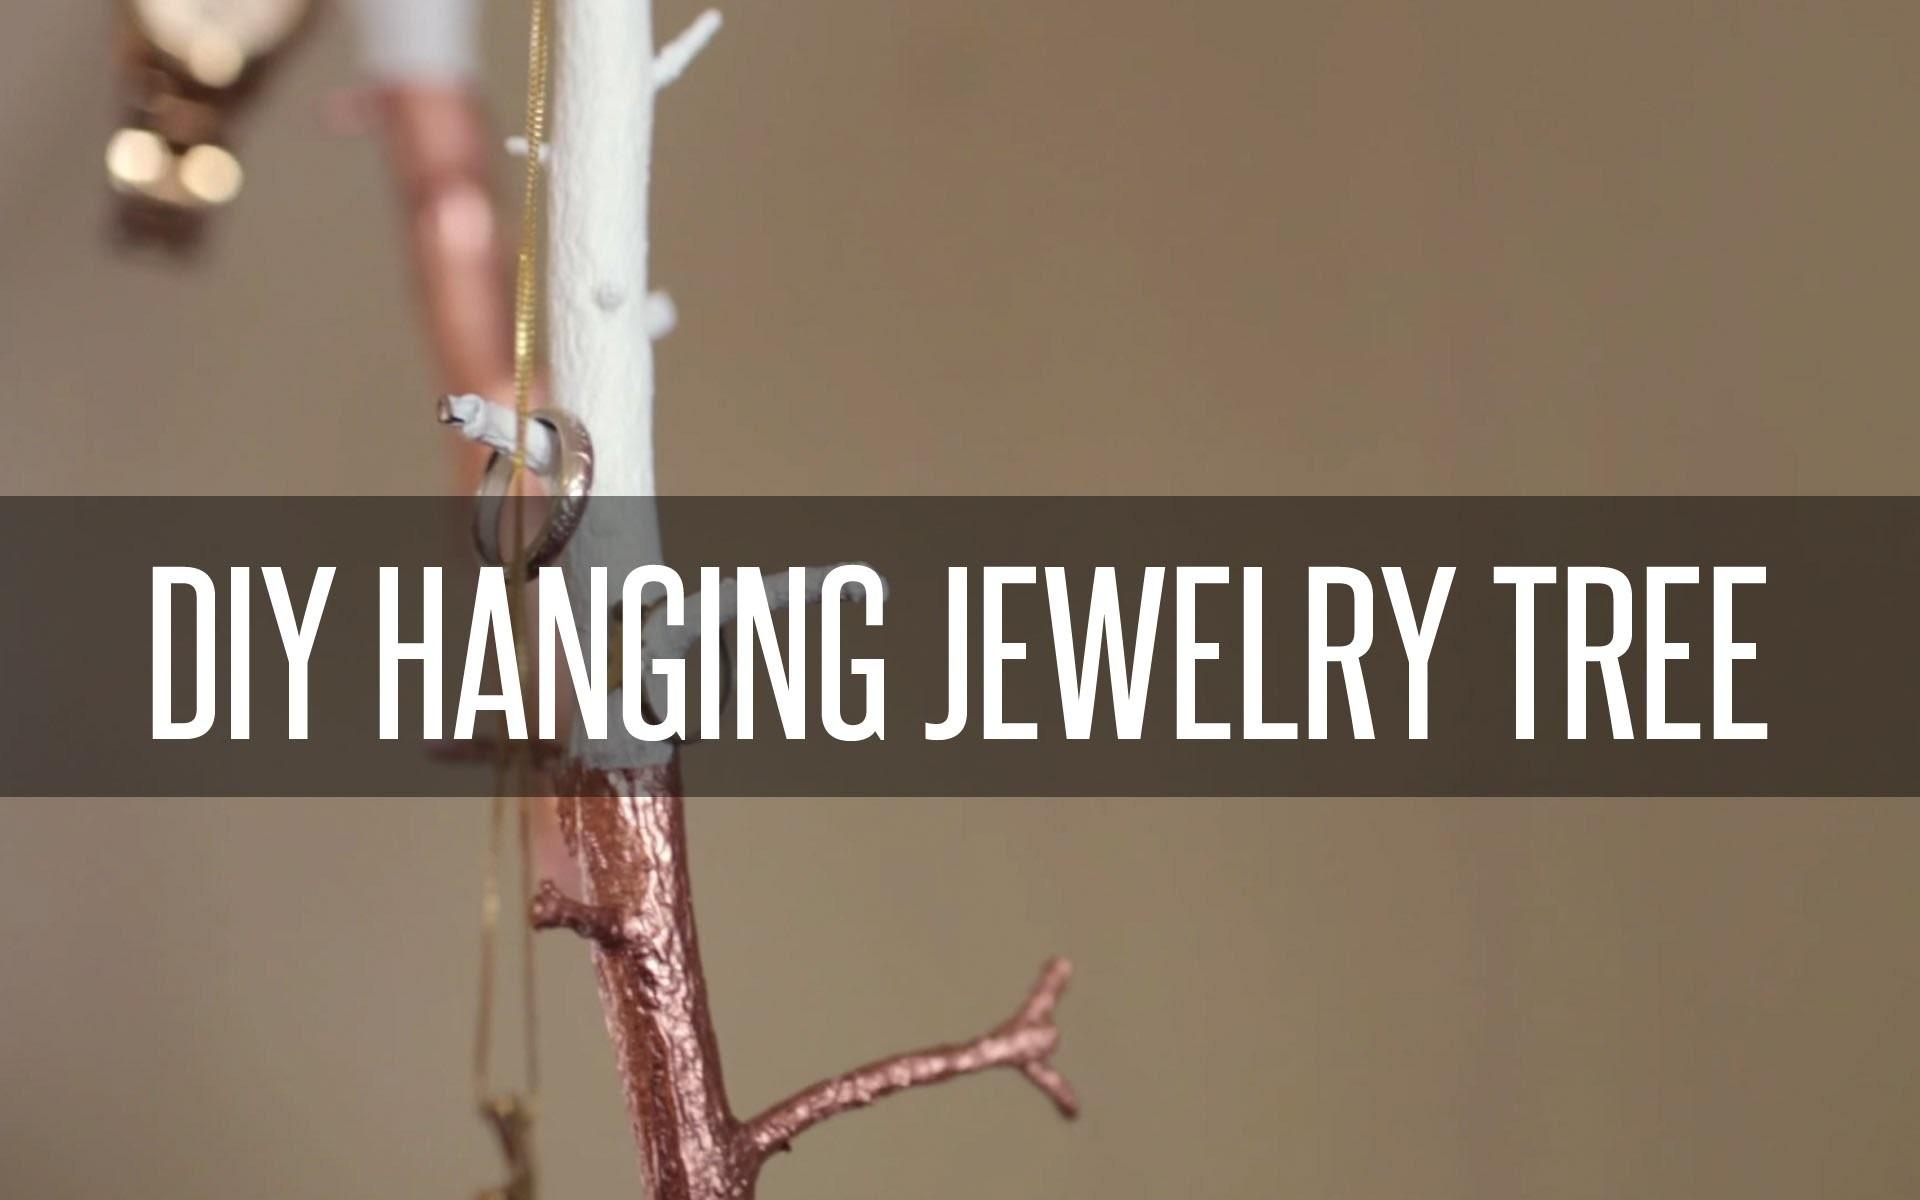 DIY HANGING JEWELRY TREE